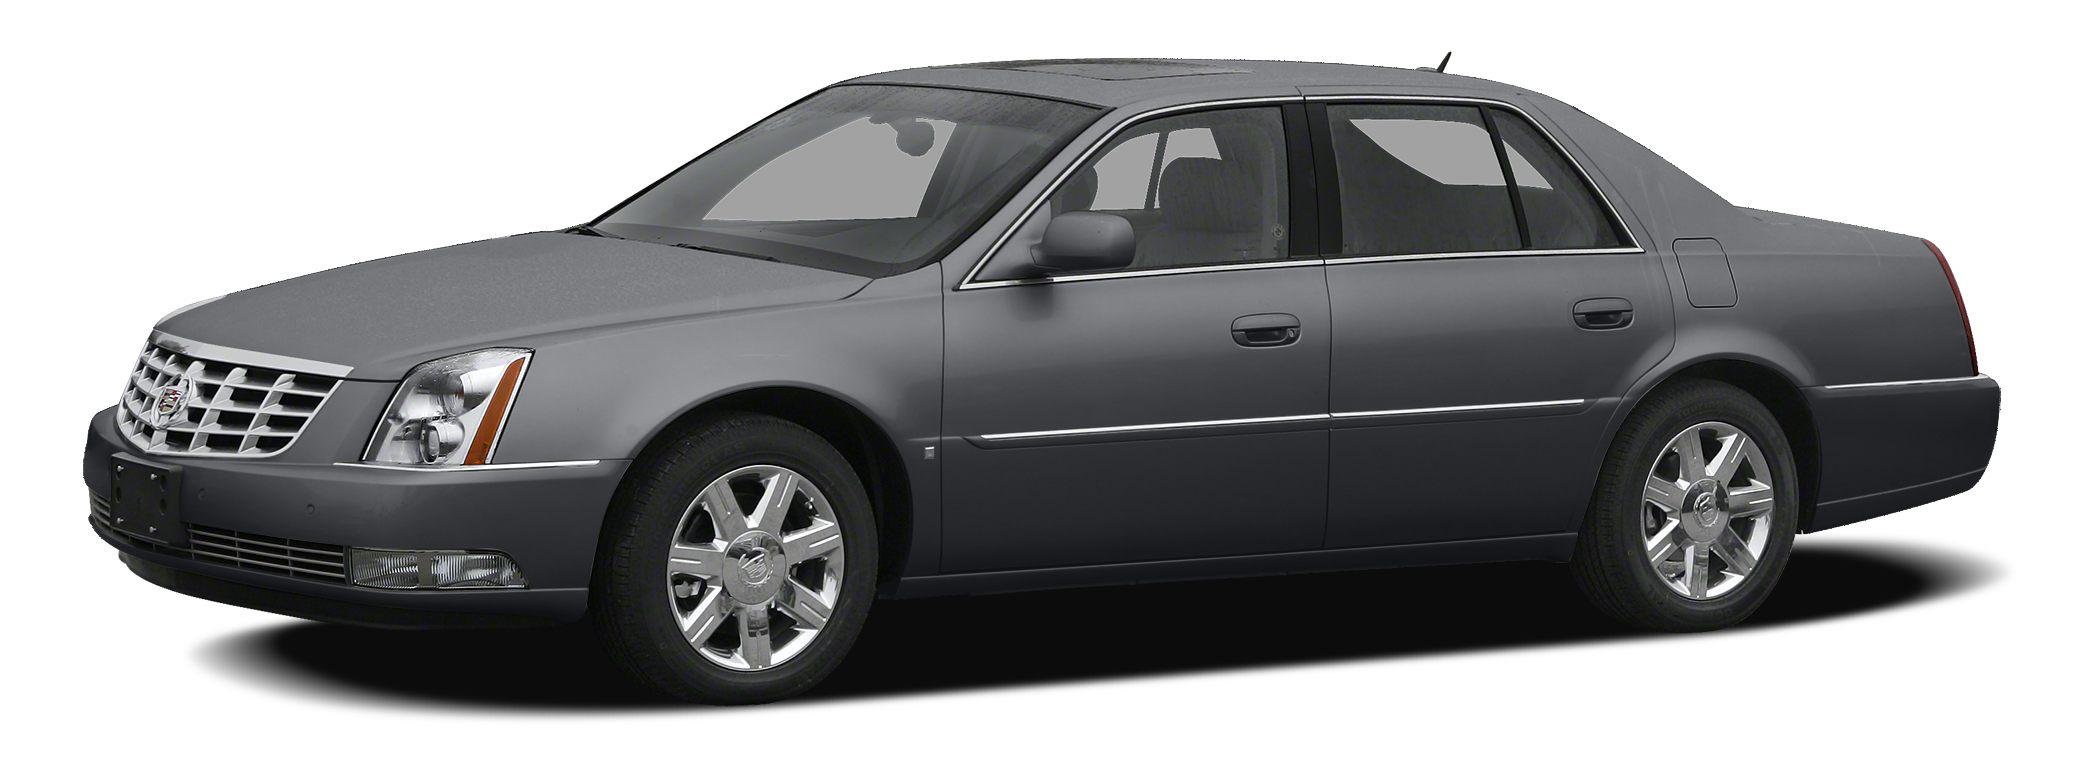 2011 Cadillac DTS Premium Miles 0Color Gray Stock CAD14078A VIN 1G6KH5E66BU111243